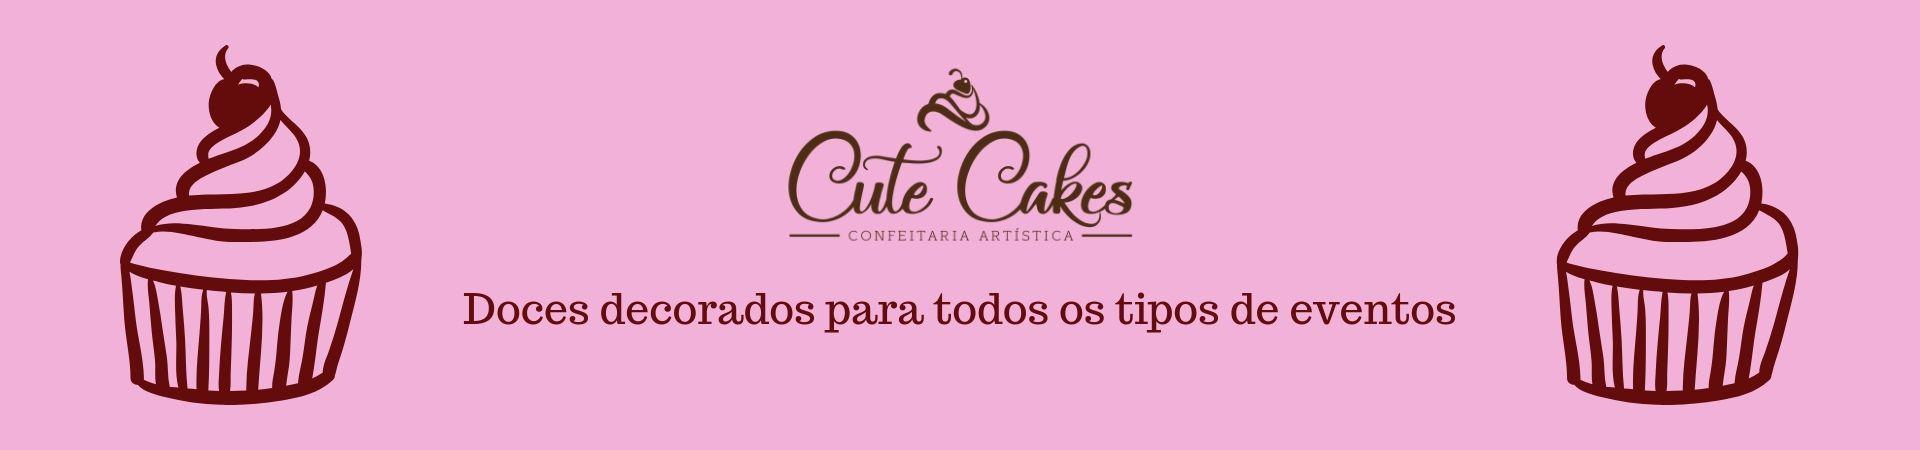 Cute Cake Confeitaria Artística